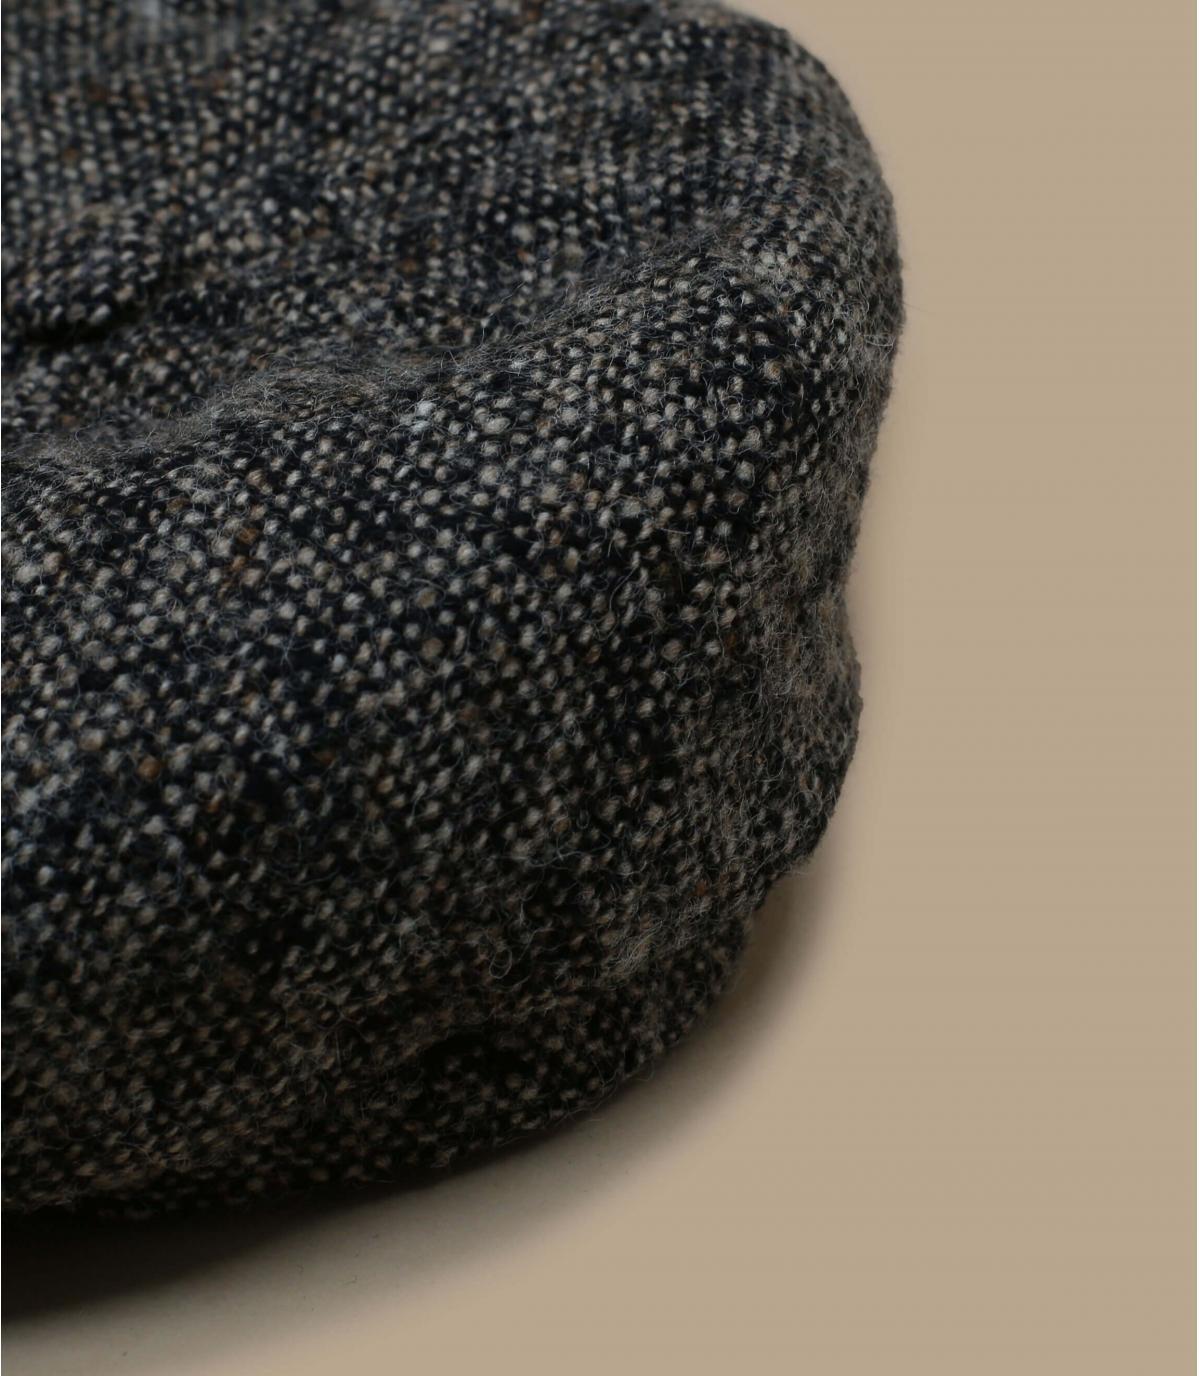 Detalles Brooklyn wool brown and leather imagen 2